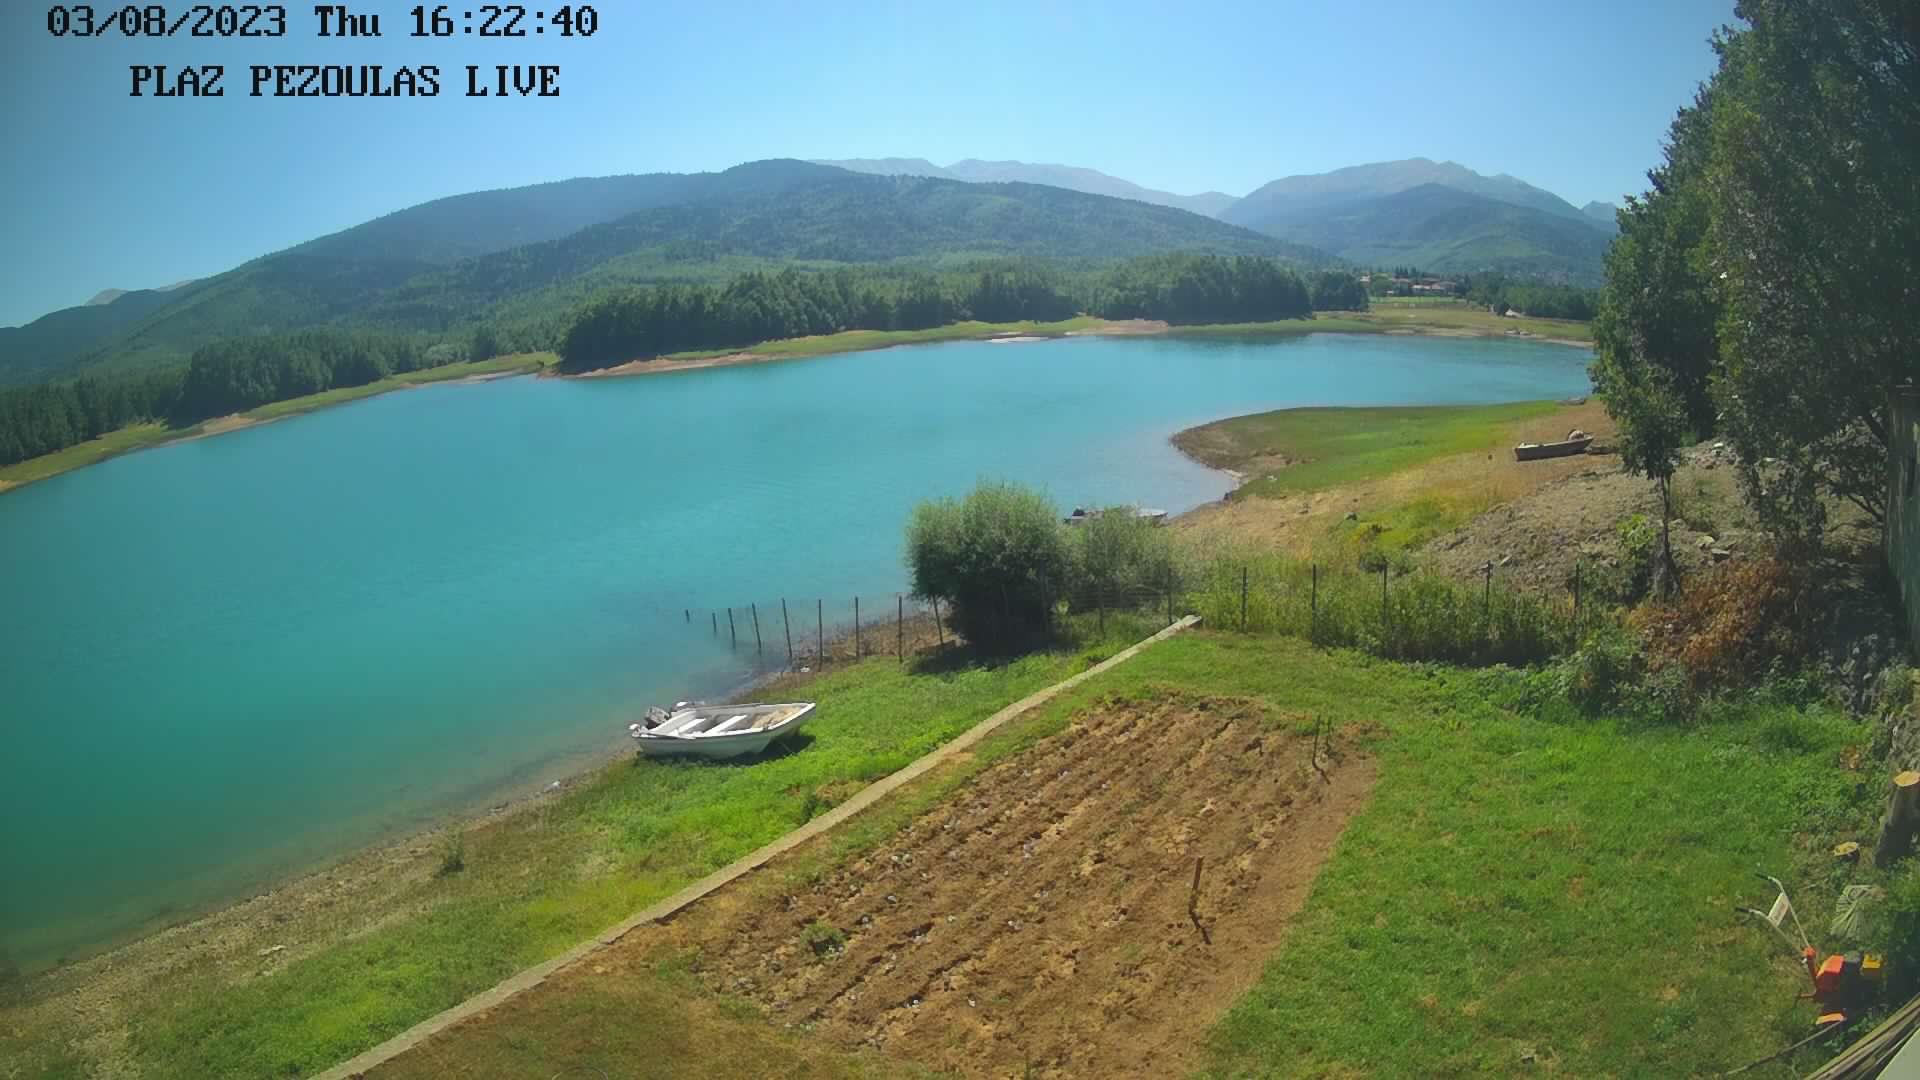 Webcam Πλαζ Λίμνη Πλαστήρα - Καρδίτσα